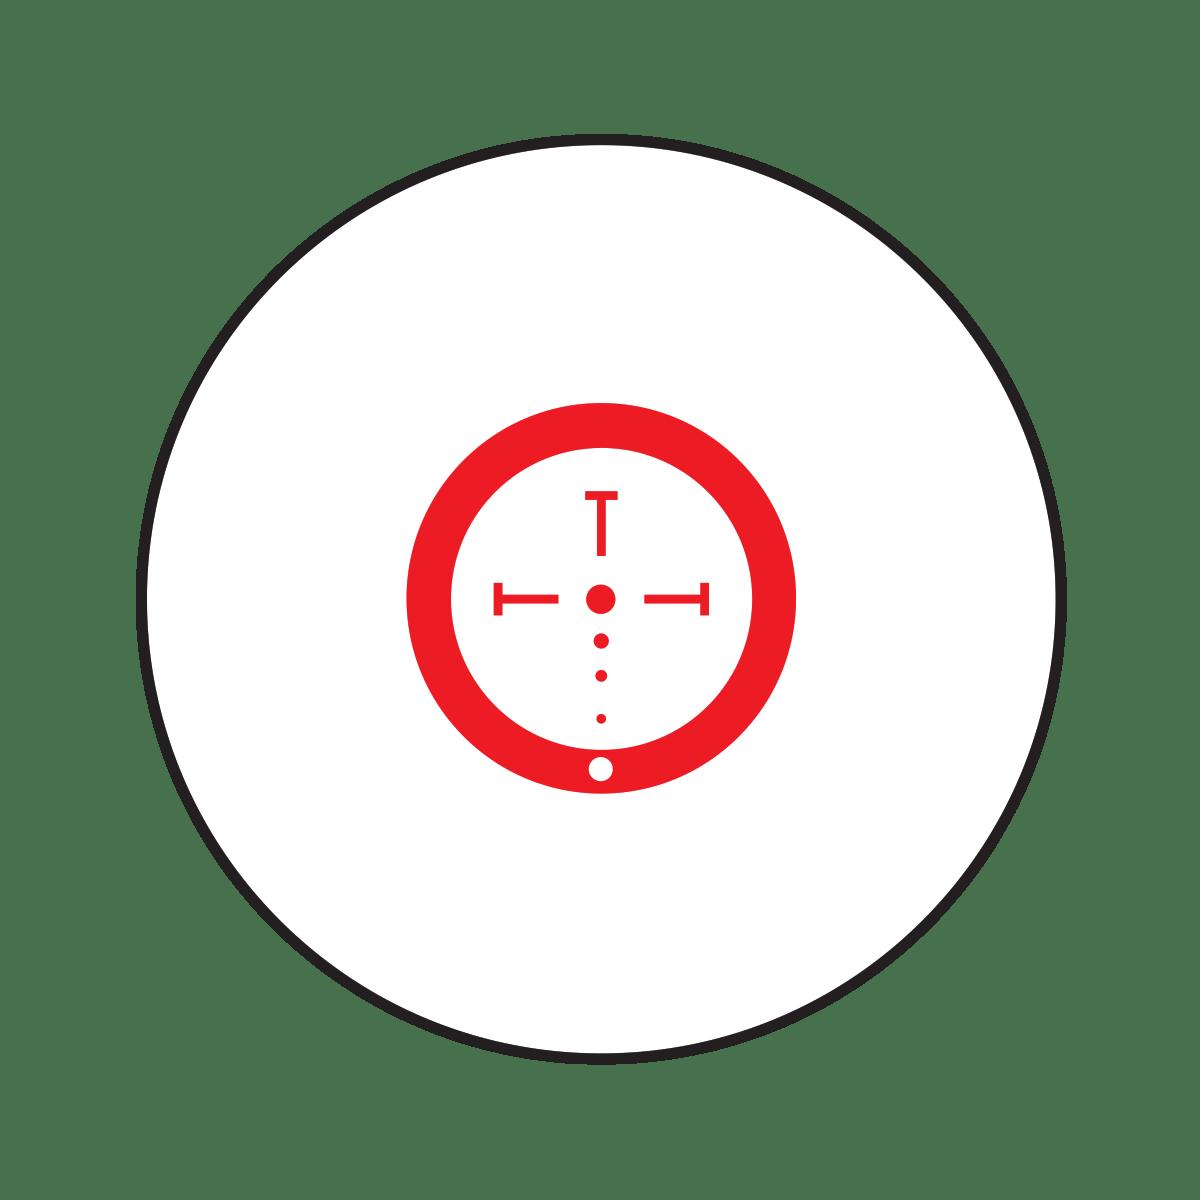 Burris AR-536 Multi-Reticle 5x Sight